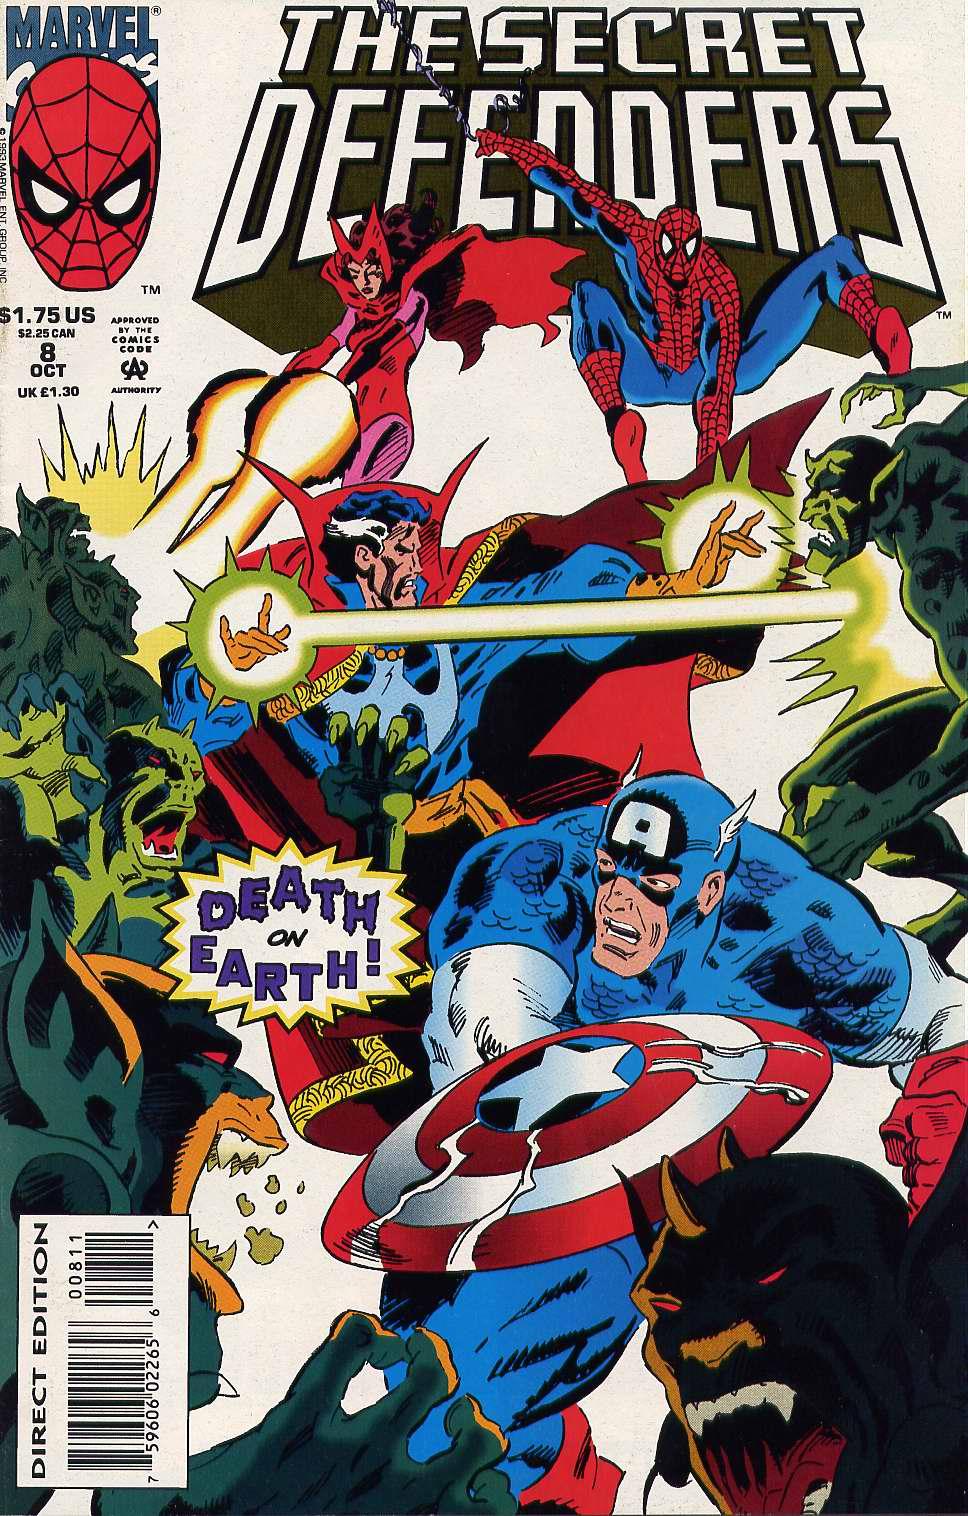 Read online Secret Defenders comic -  Issue #8 - 1